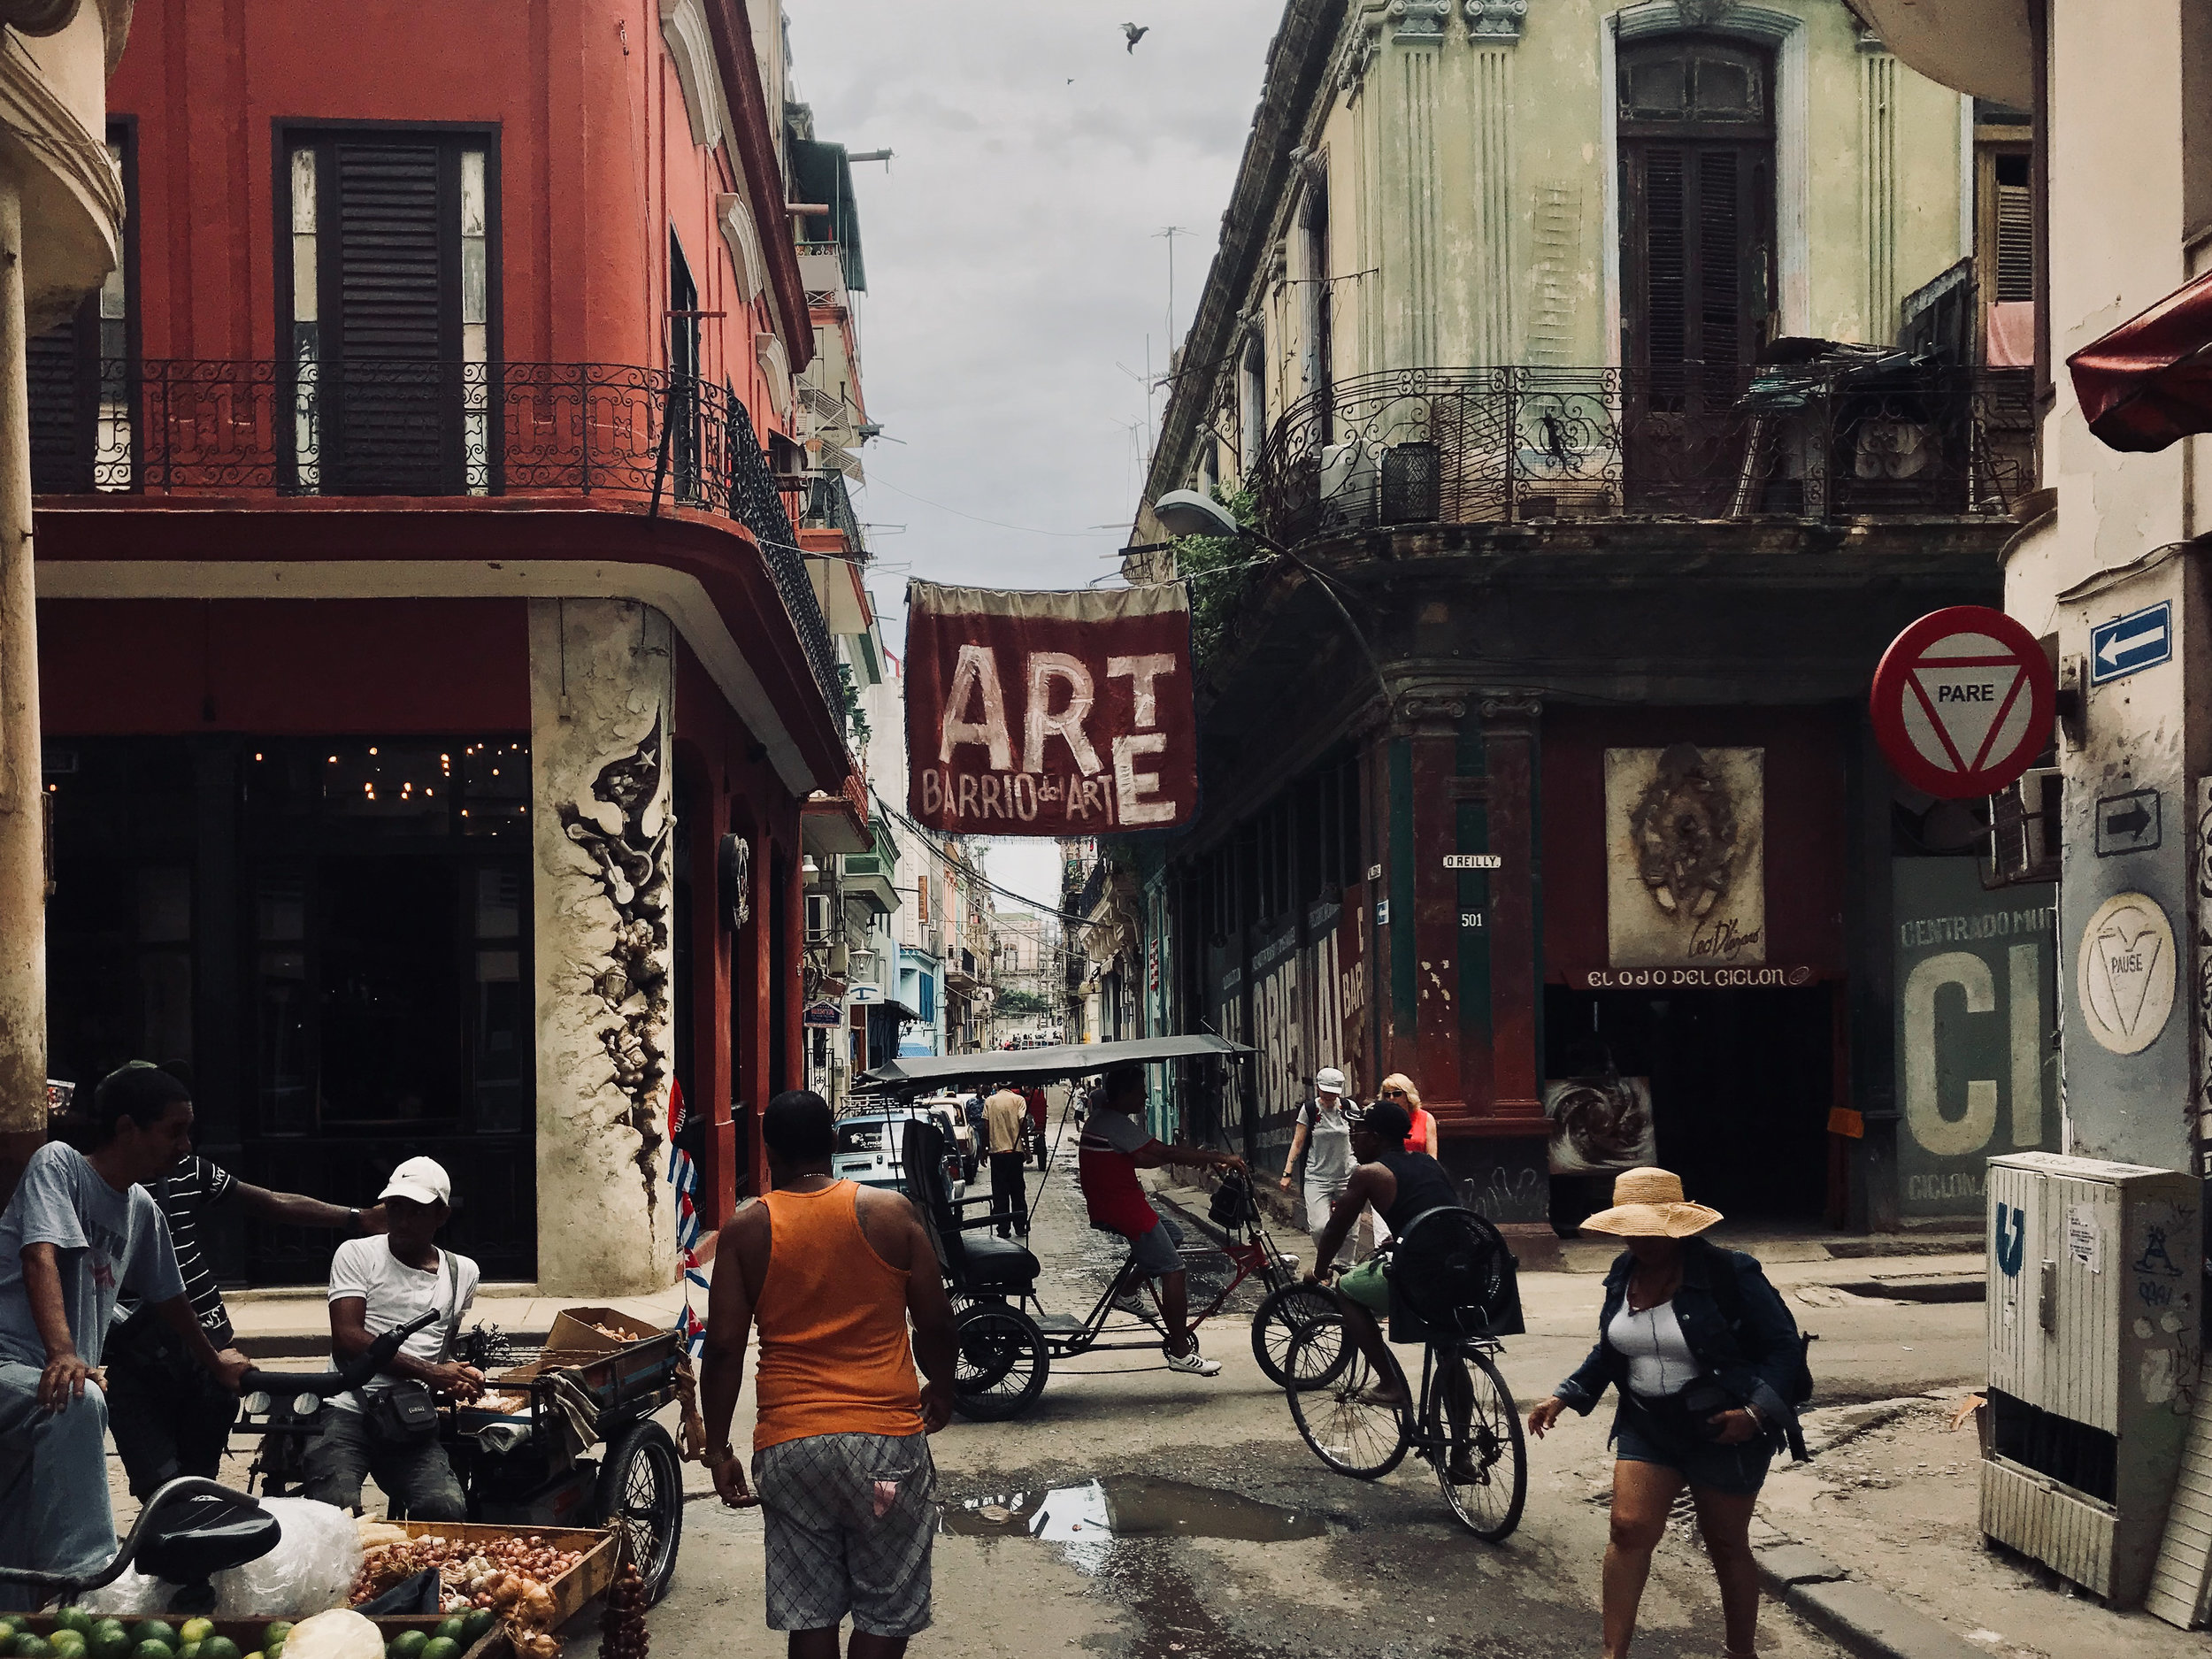 Barrio de arte Havana Cuba.jpg